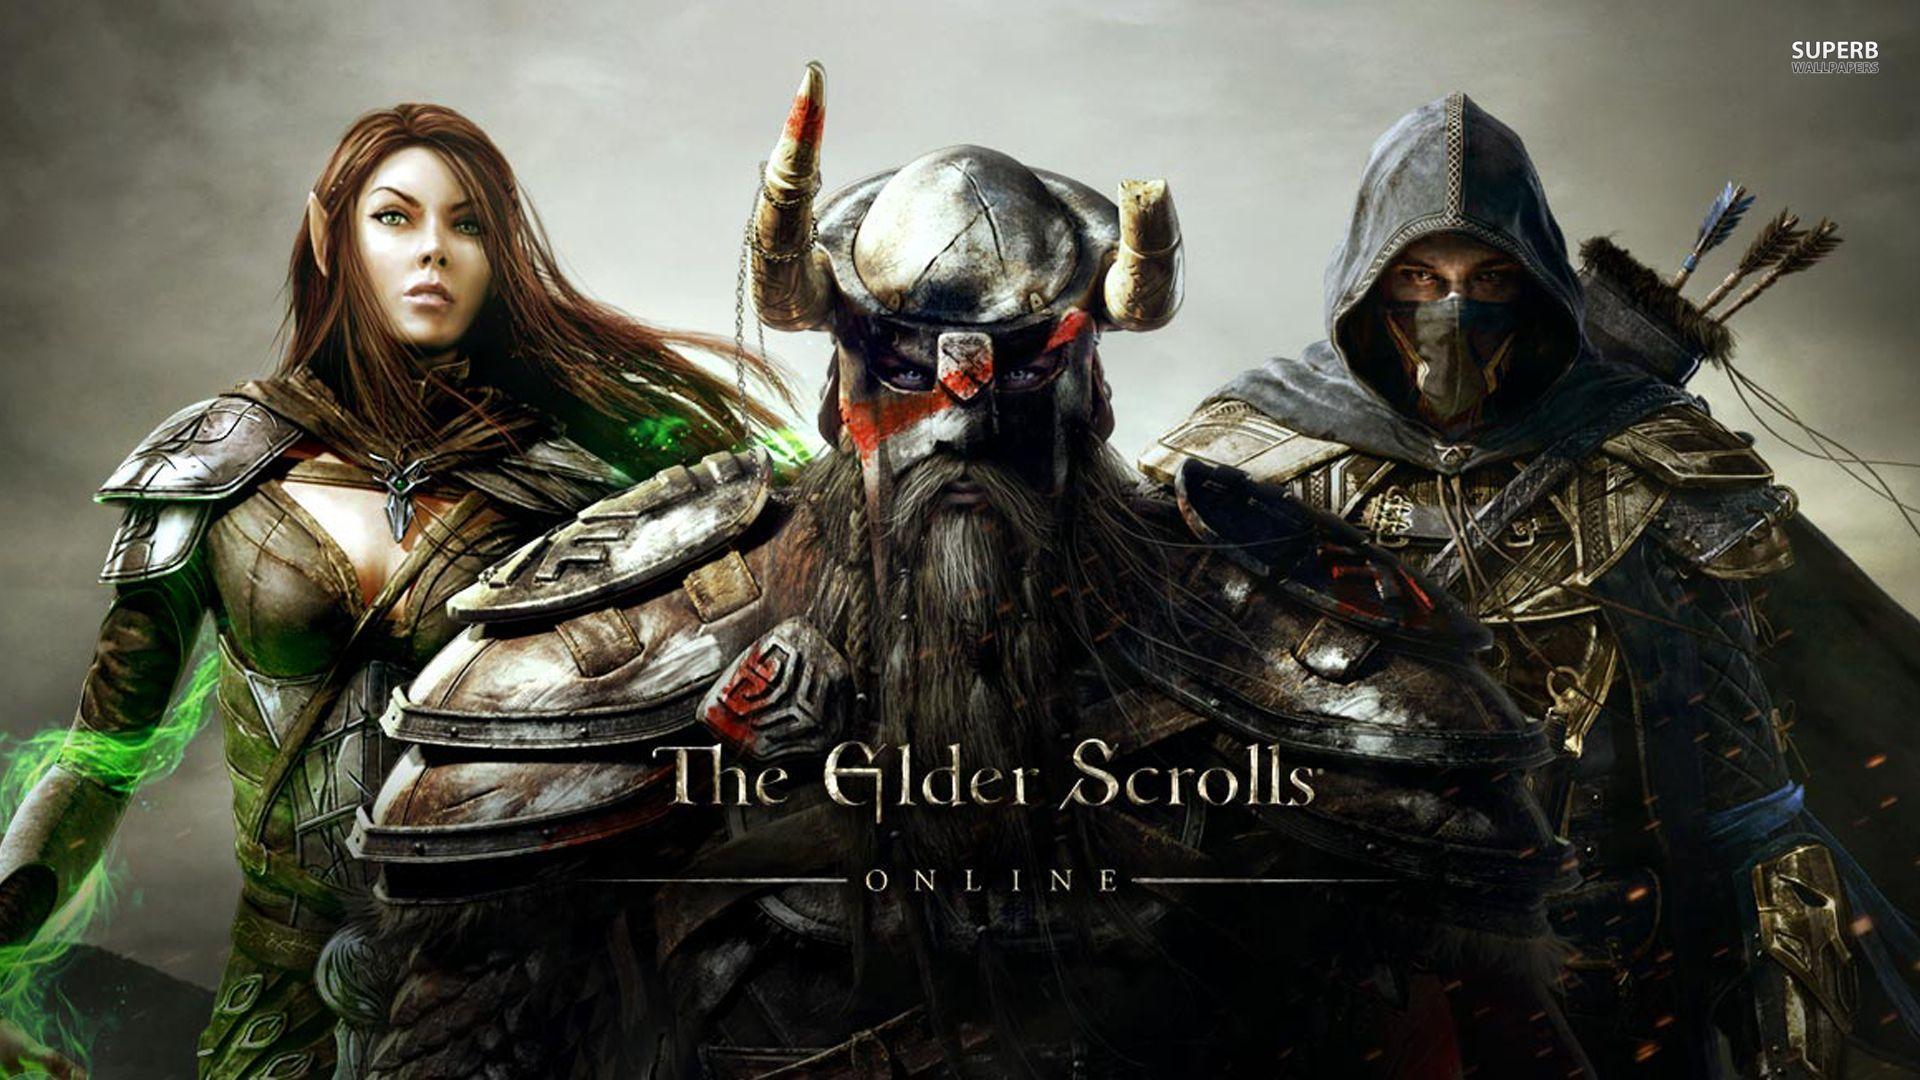 Арт к игре The Elder Scrolls Online